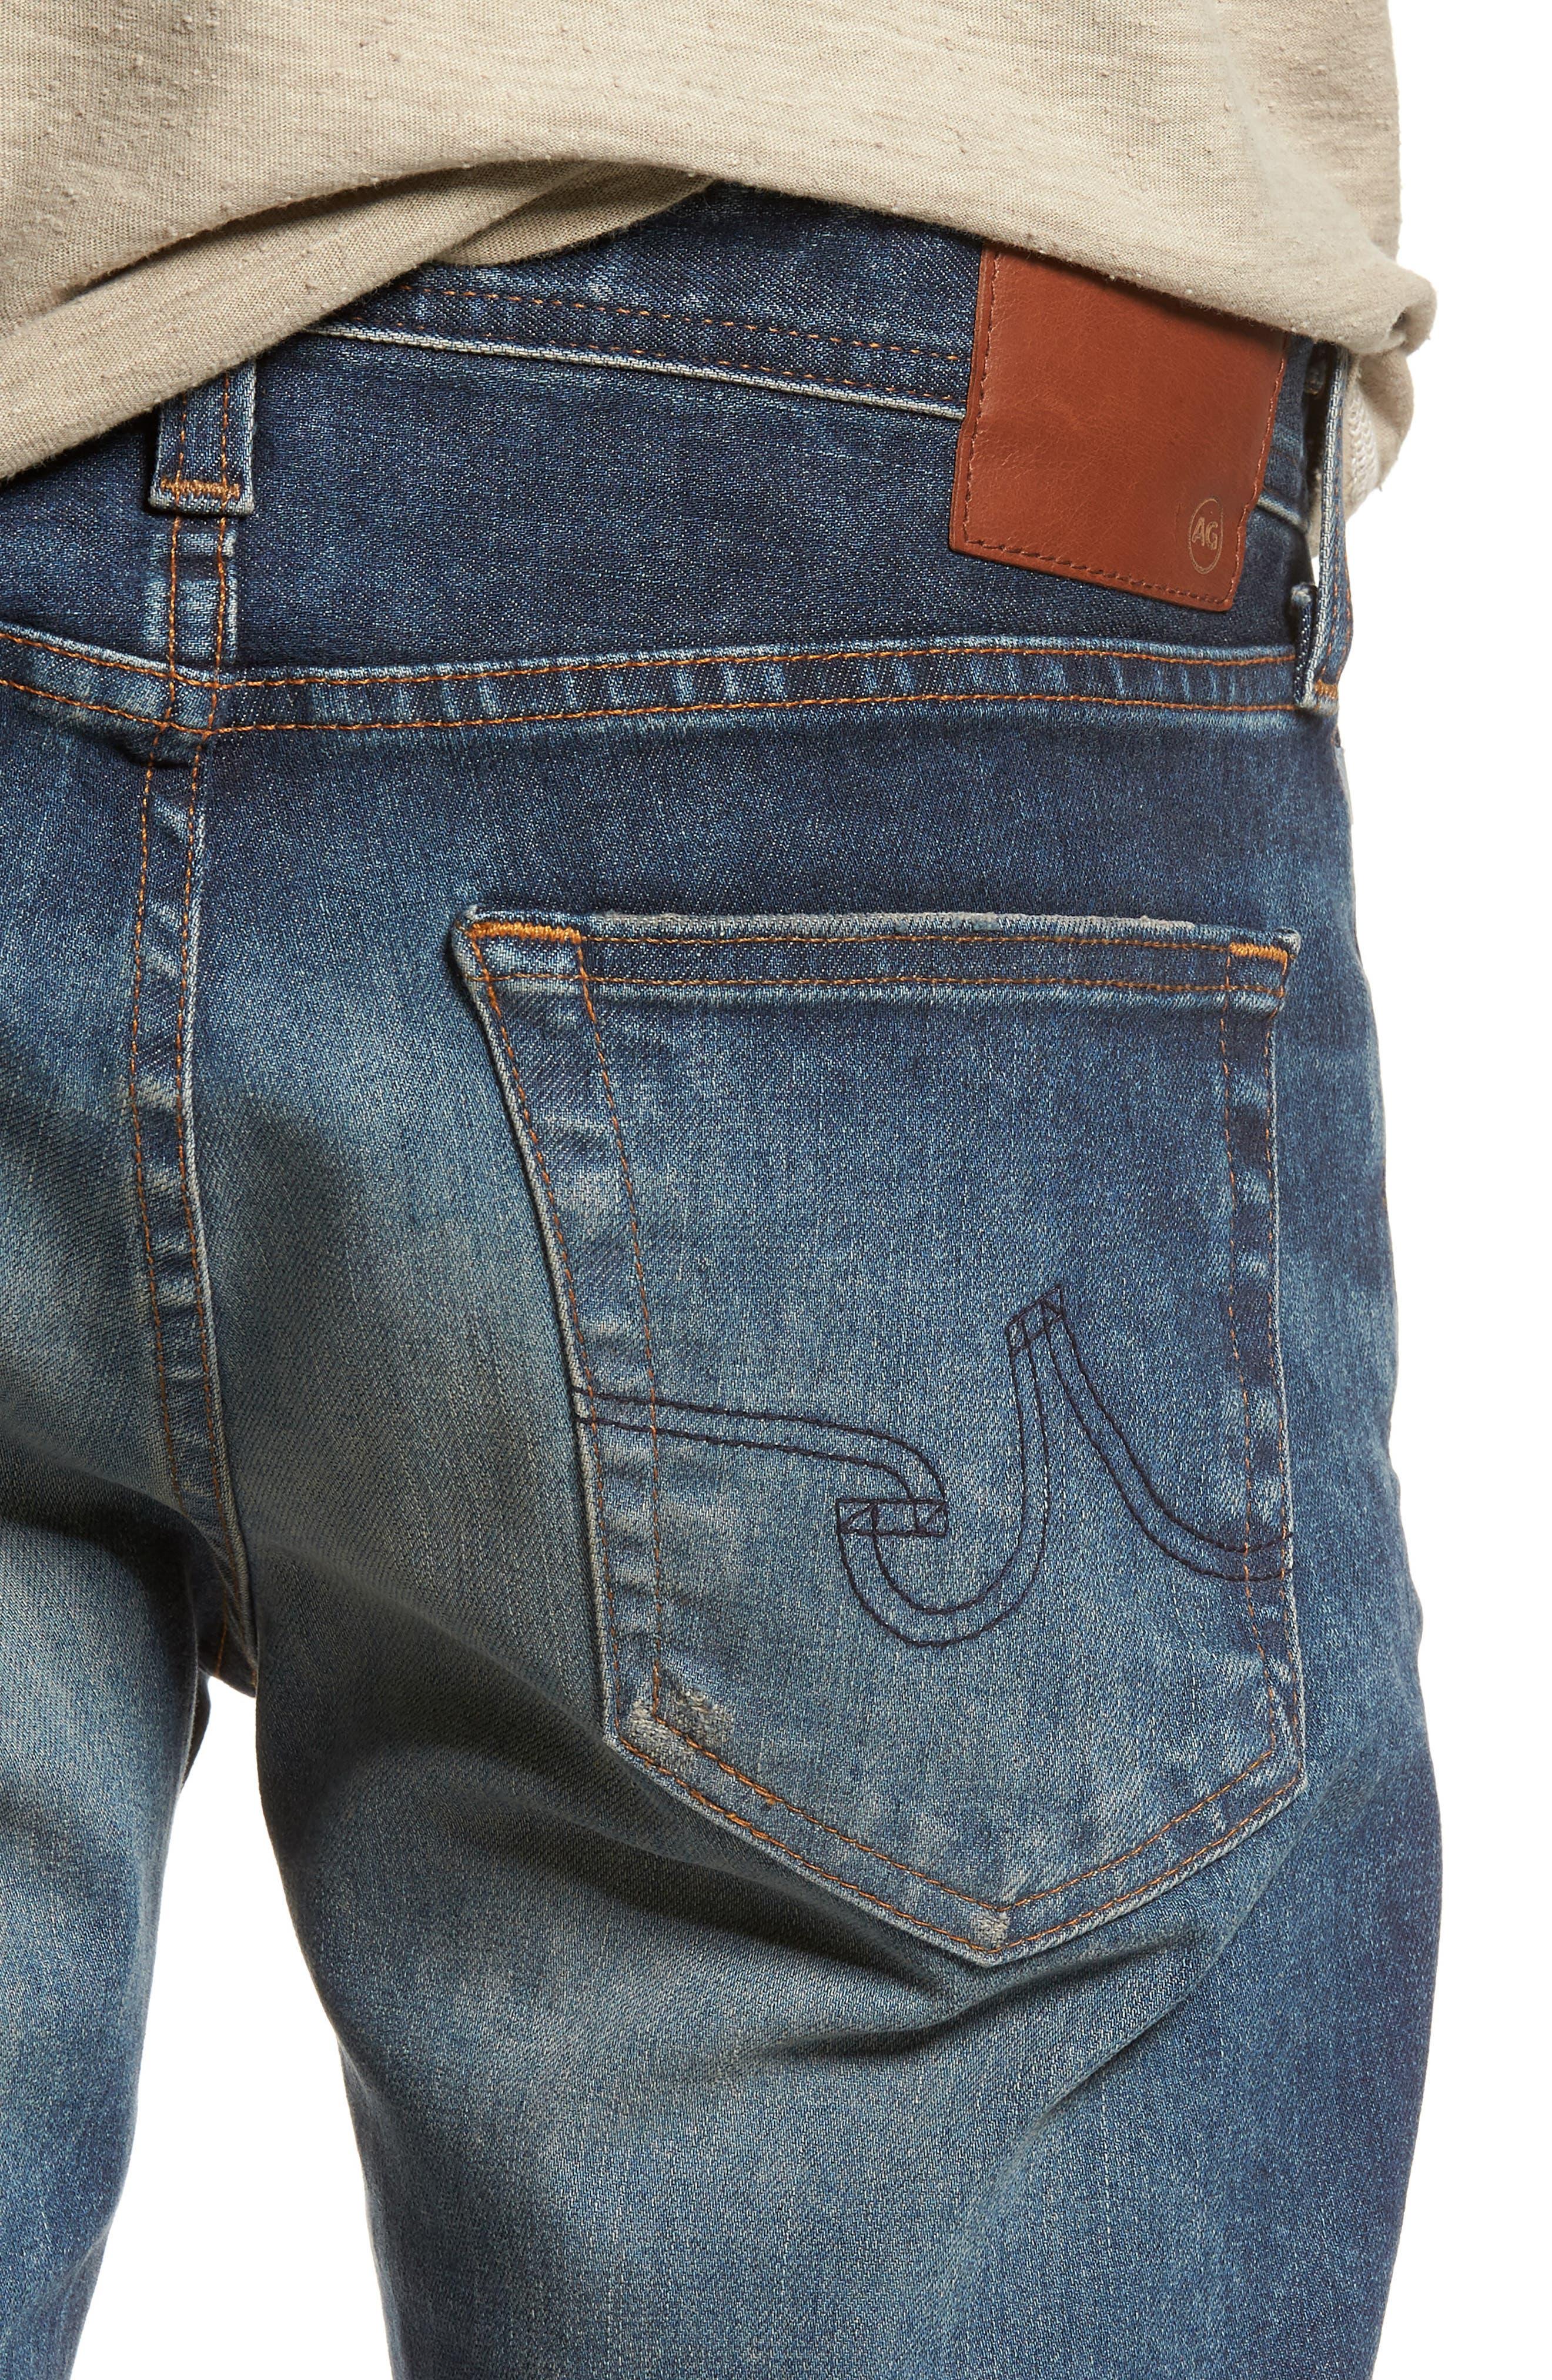 Dylan Slim Skinny Fit Jeans,                             Alternate thumbnail 4, color,                             451